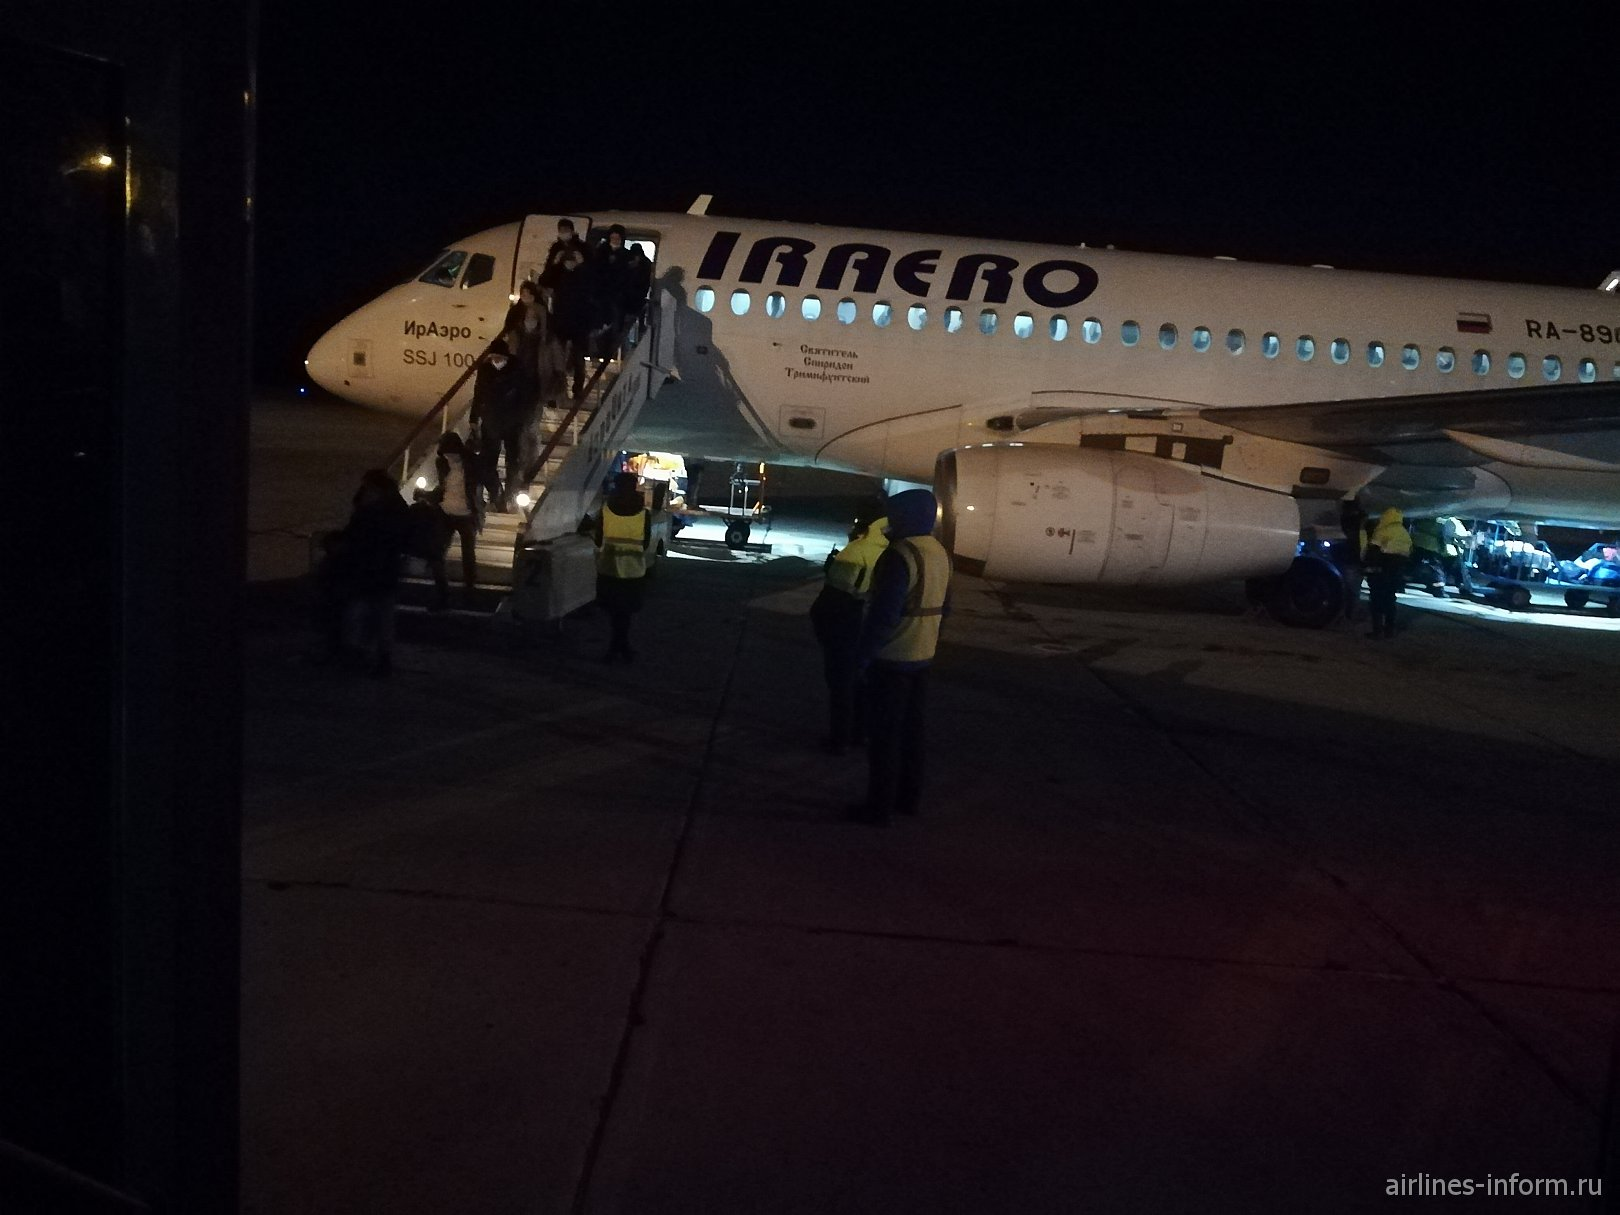 Иркутск (IKT) - Чита (HTA) с Ираэро на SSJ-100